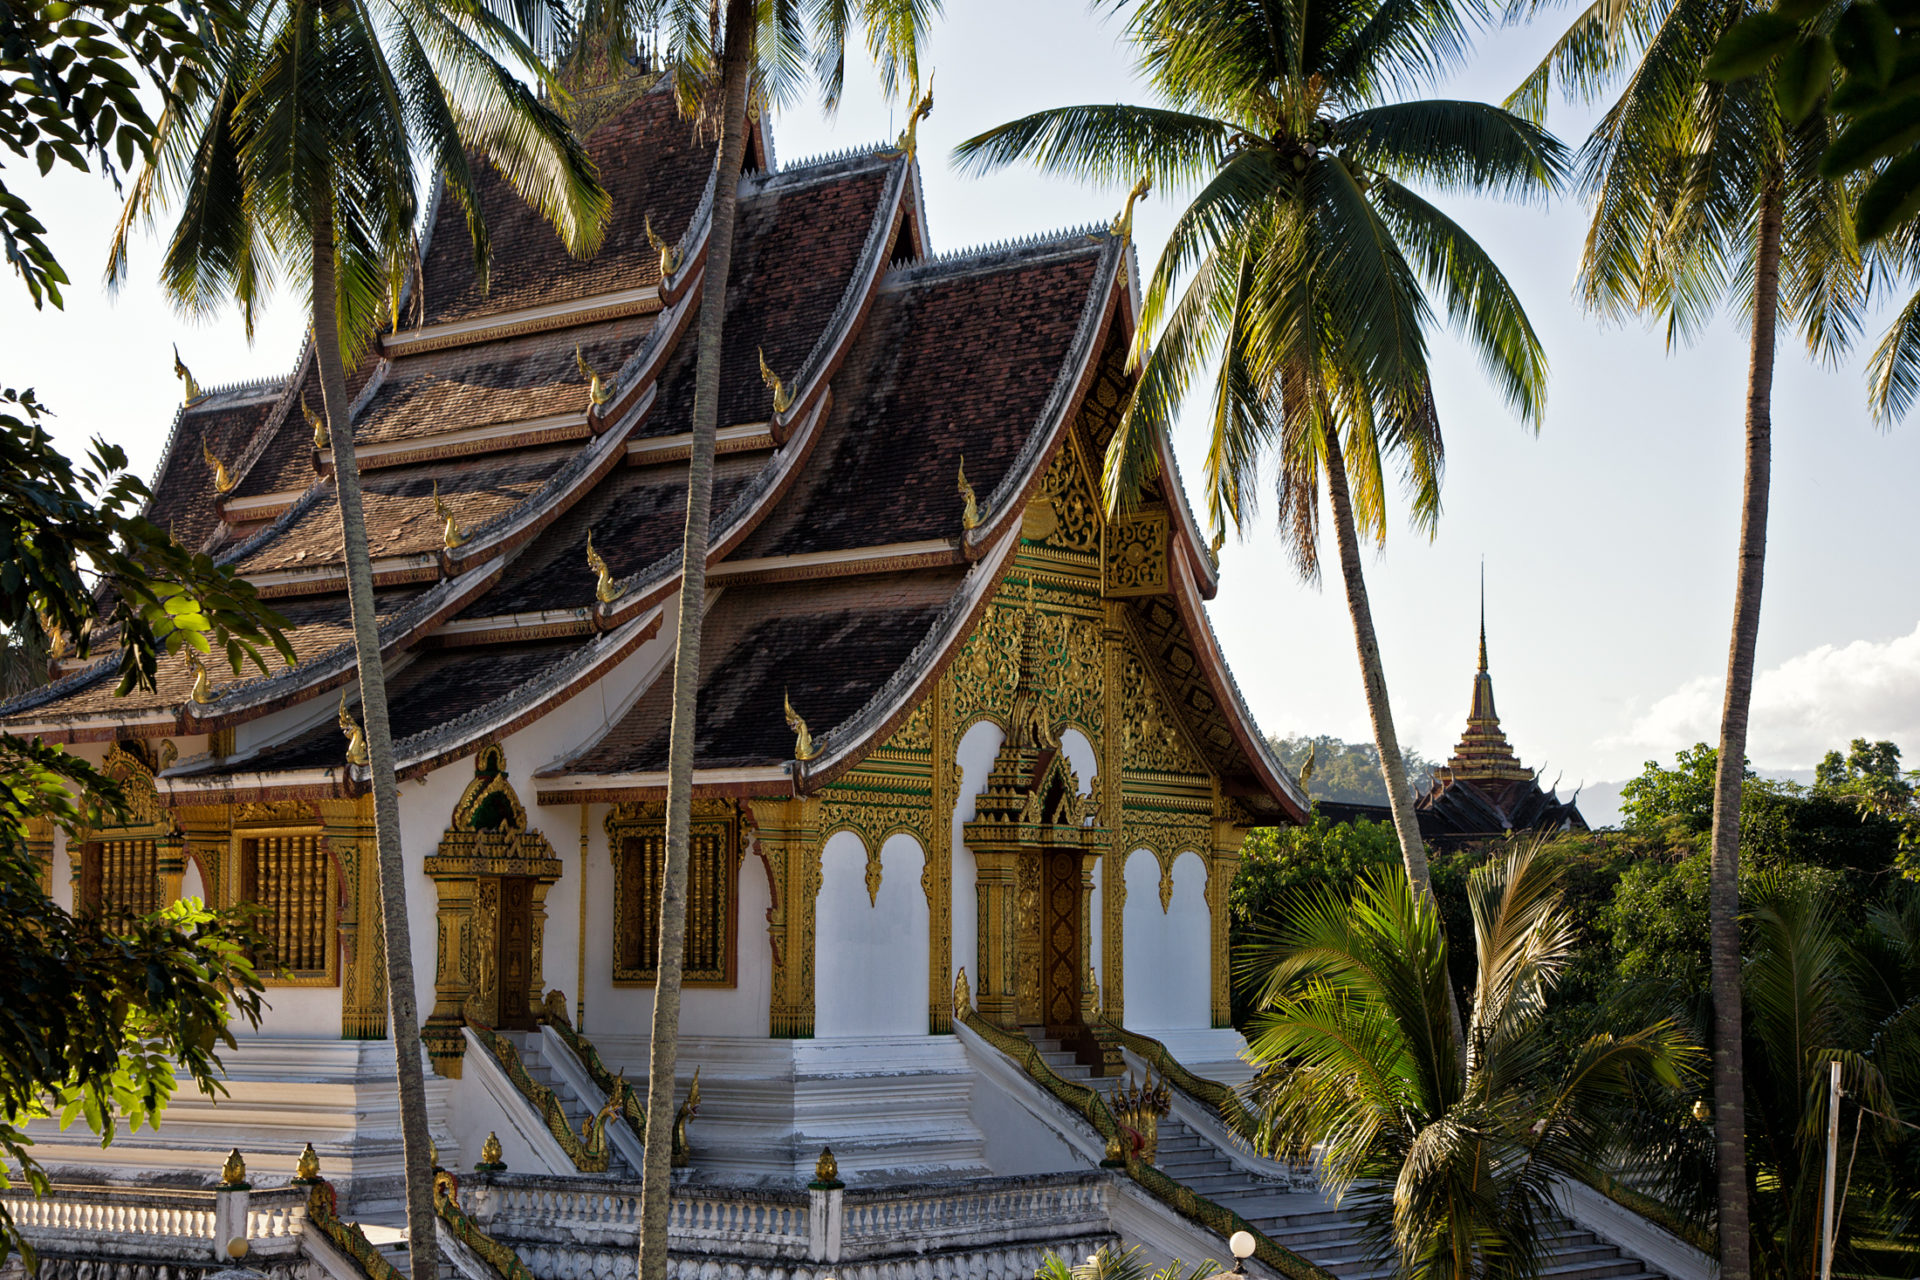 Luang Prabang - Royal Palace Museum